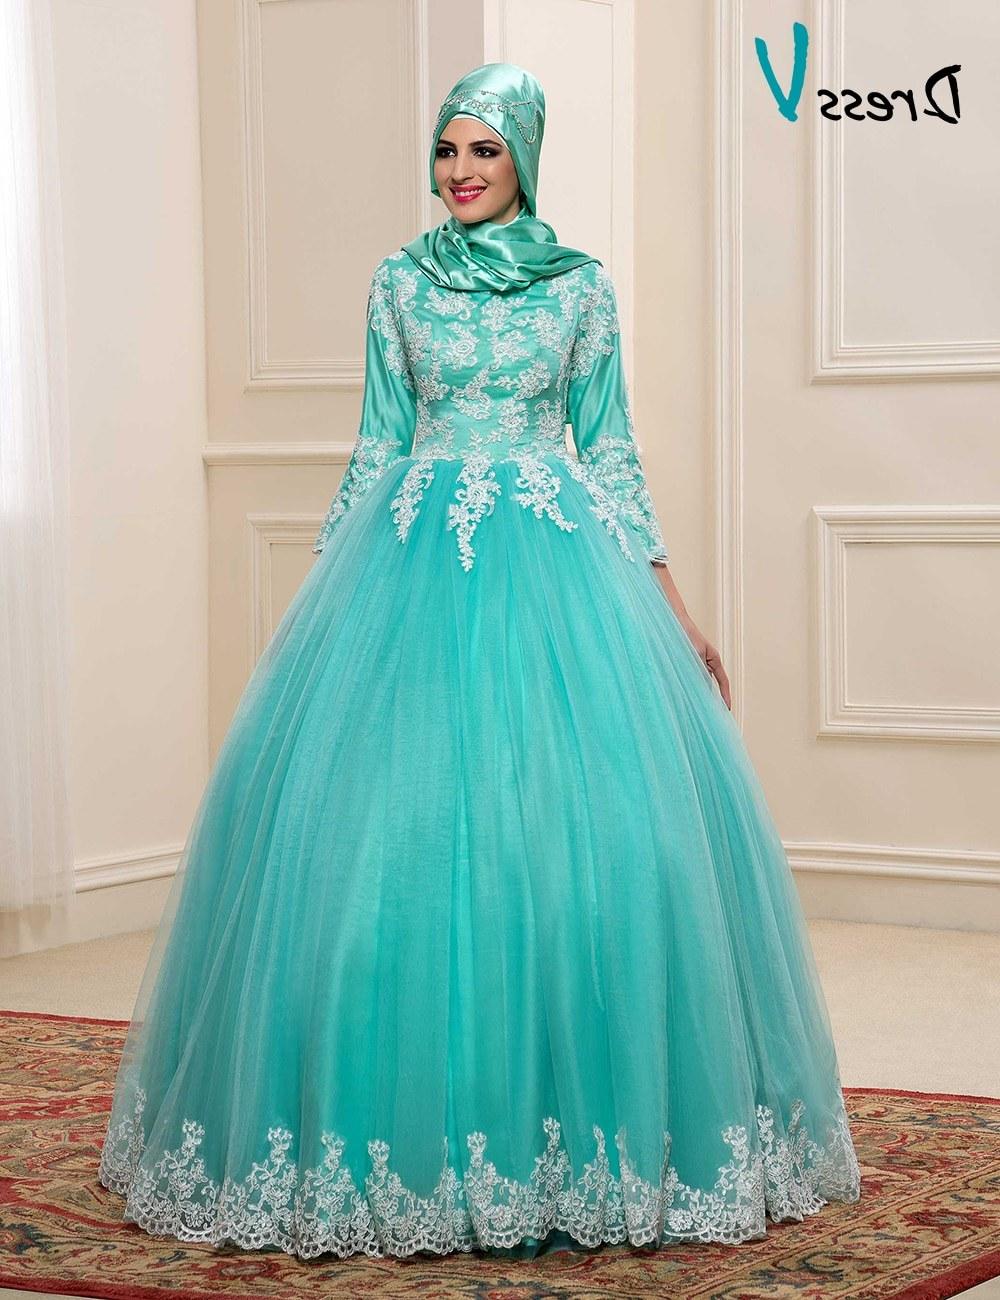 Inspirasi Model Baju Pengantin Muslim Terbaru T8dj islamic Hijab Wedding Dresses – Fashion Dresses